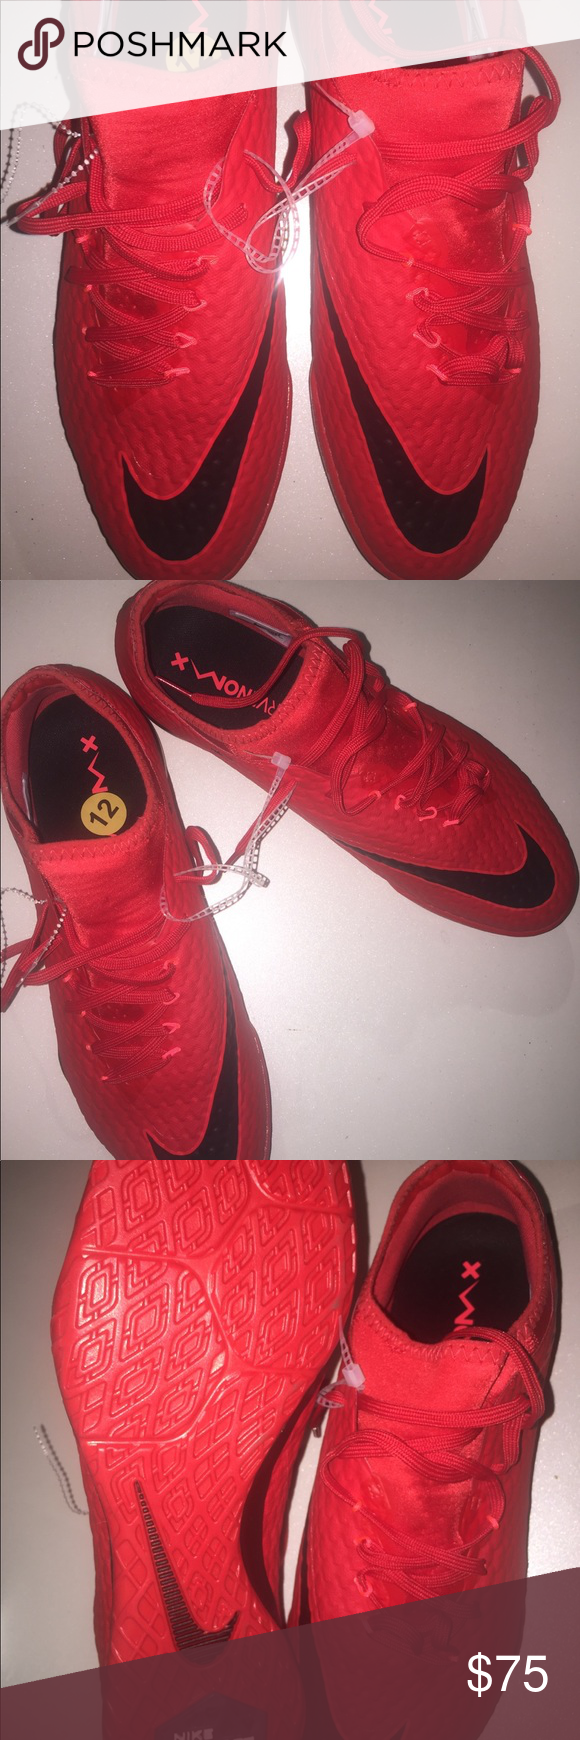 6a92a4e7c Nike Hyper-Venom X Finale II Nike Hypervenom X Finale II IC  Court Street Futsal Soccer Shoes •Color  University Red Black Bright Crimson  (852572-616 ) ...